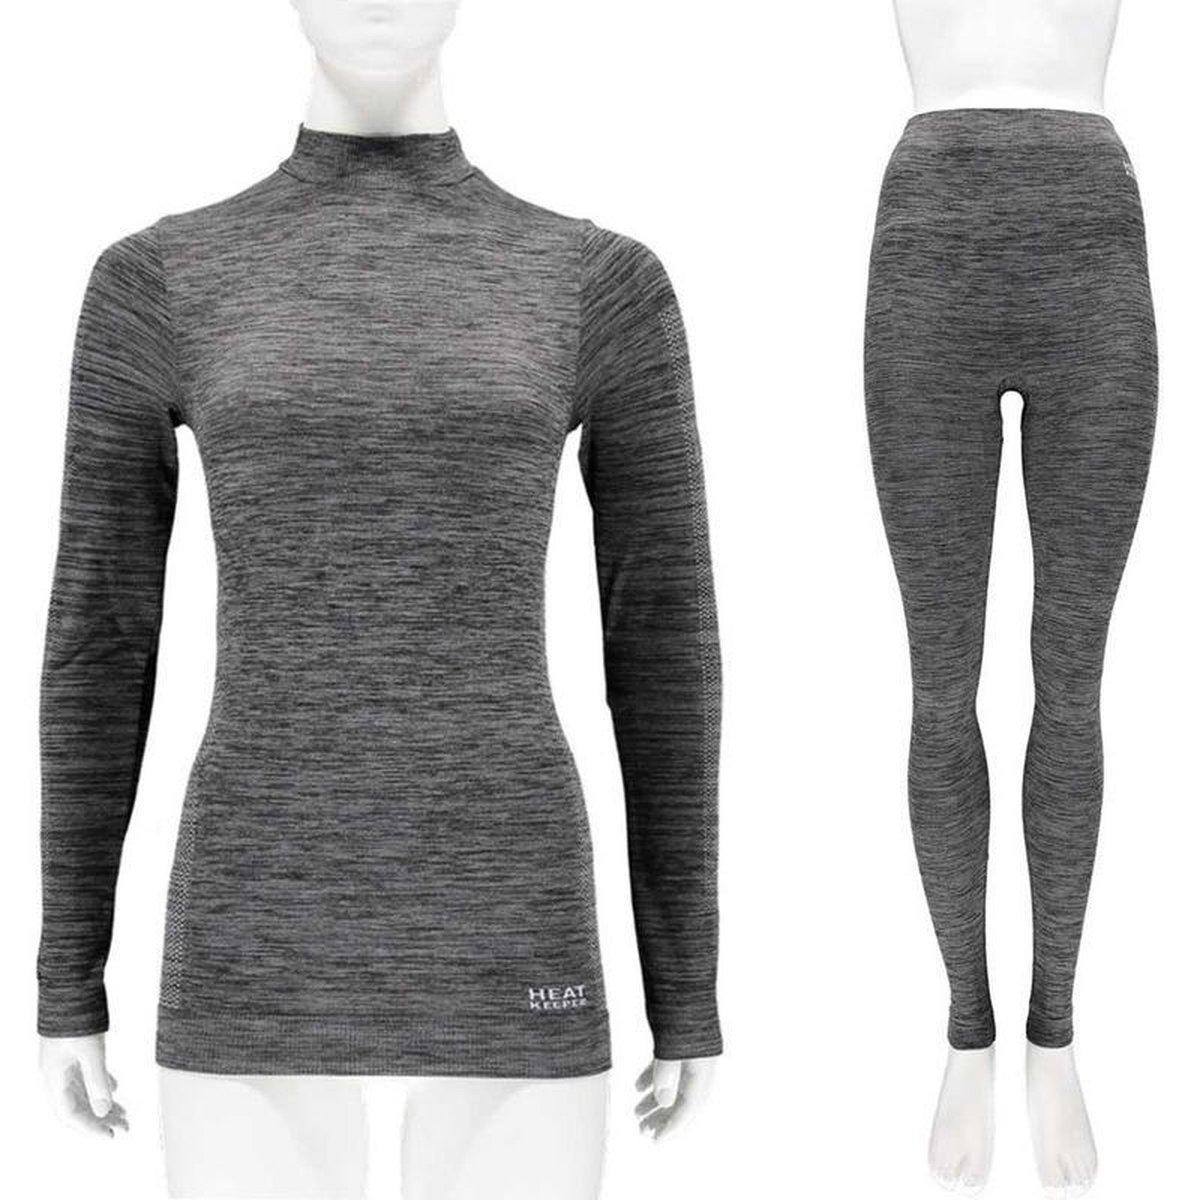 Thermo onderkleding set voor dames zwart melange - maat S - shirt lange mouw en broek - Wintersport kleding - Thermokleding